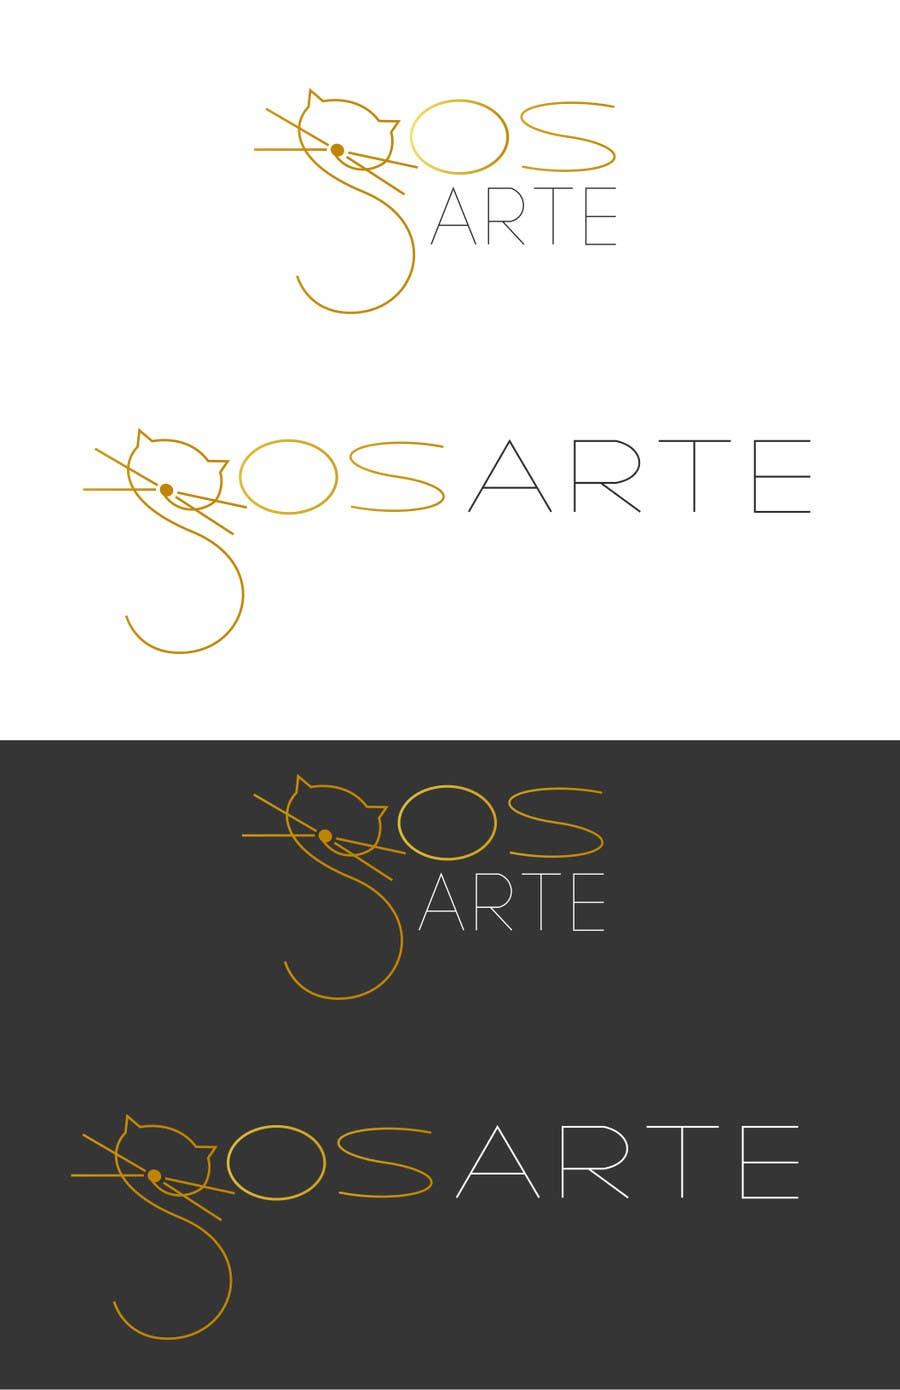 Kilpailutyö #                                        49                                      kilpailussa                                         Logo para GOSarte(www.octaviosegura.com)